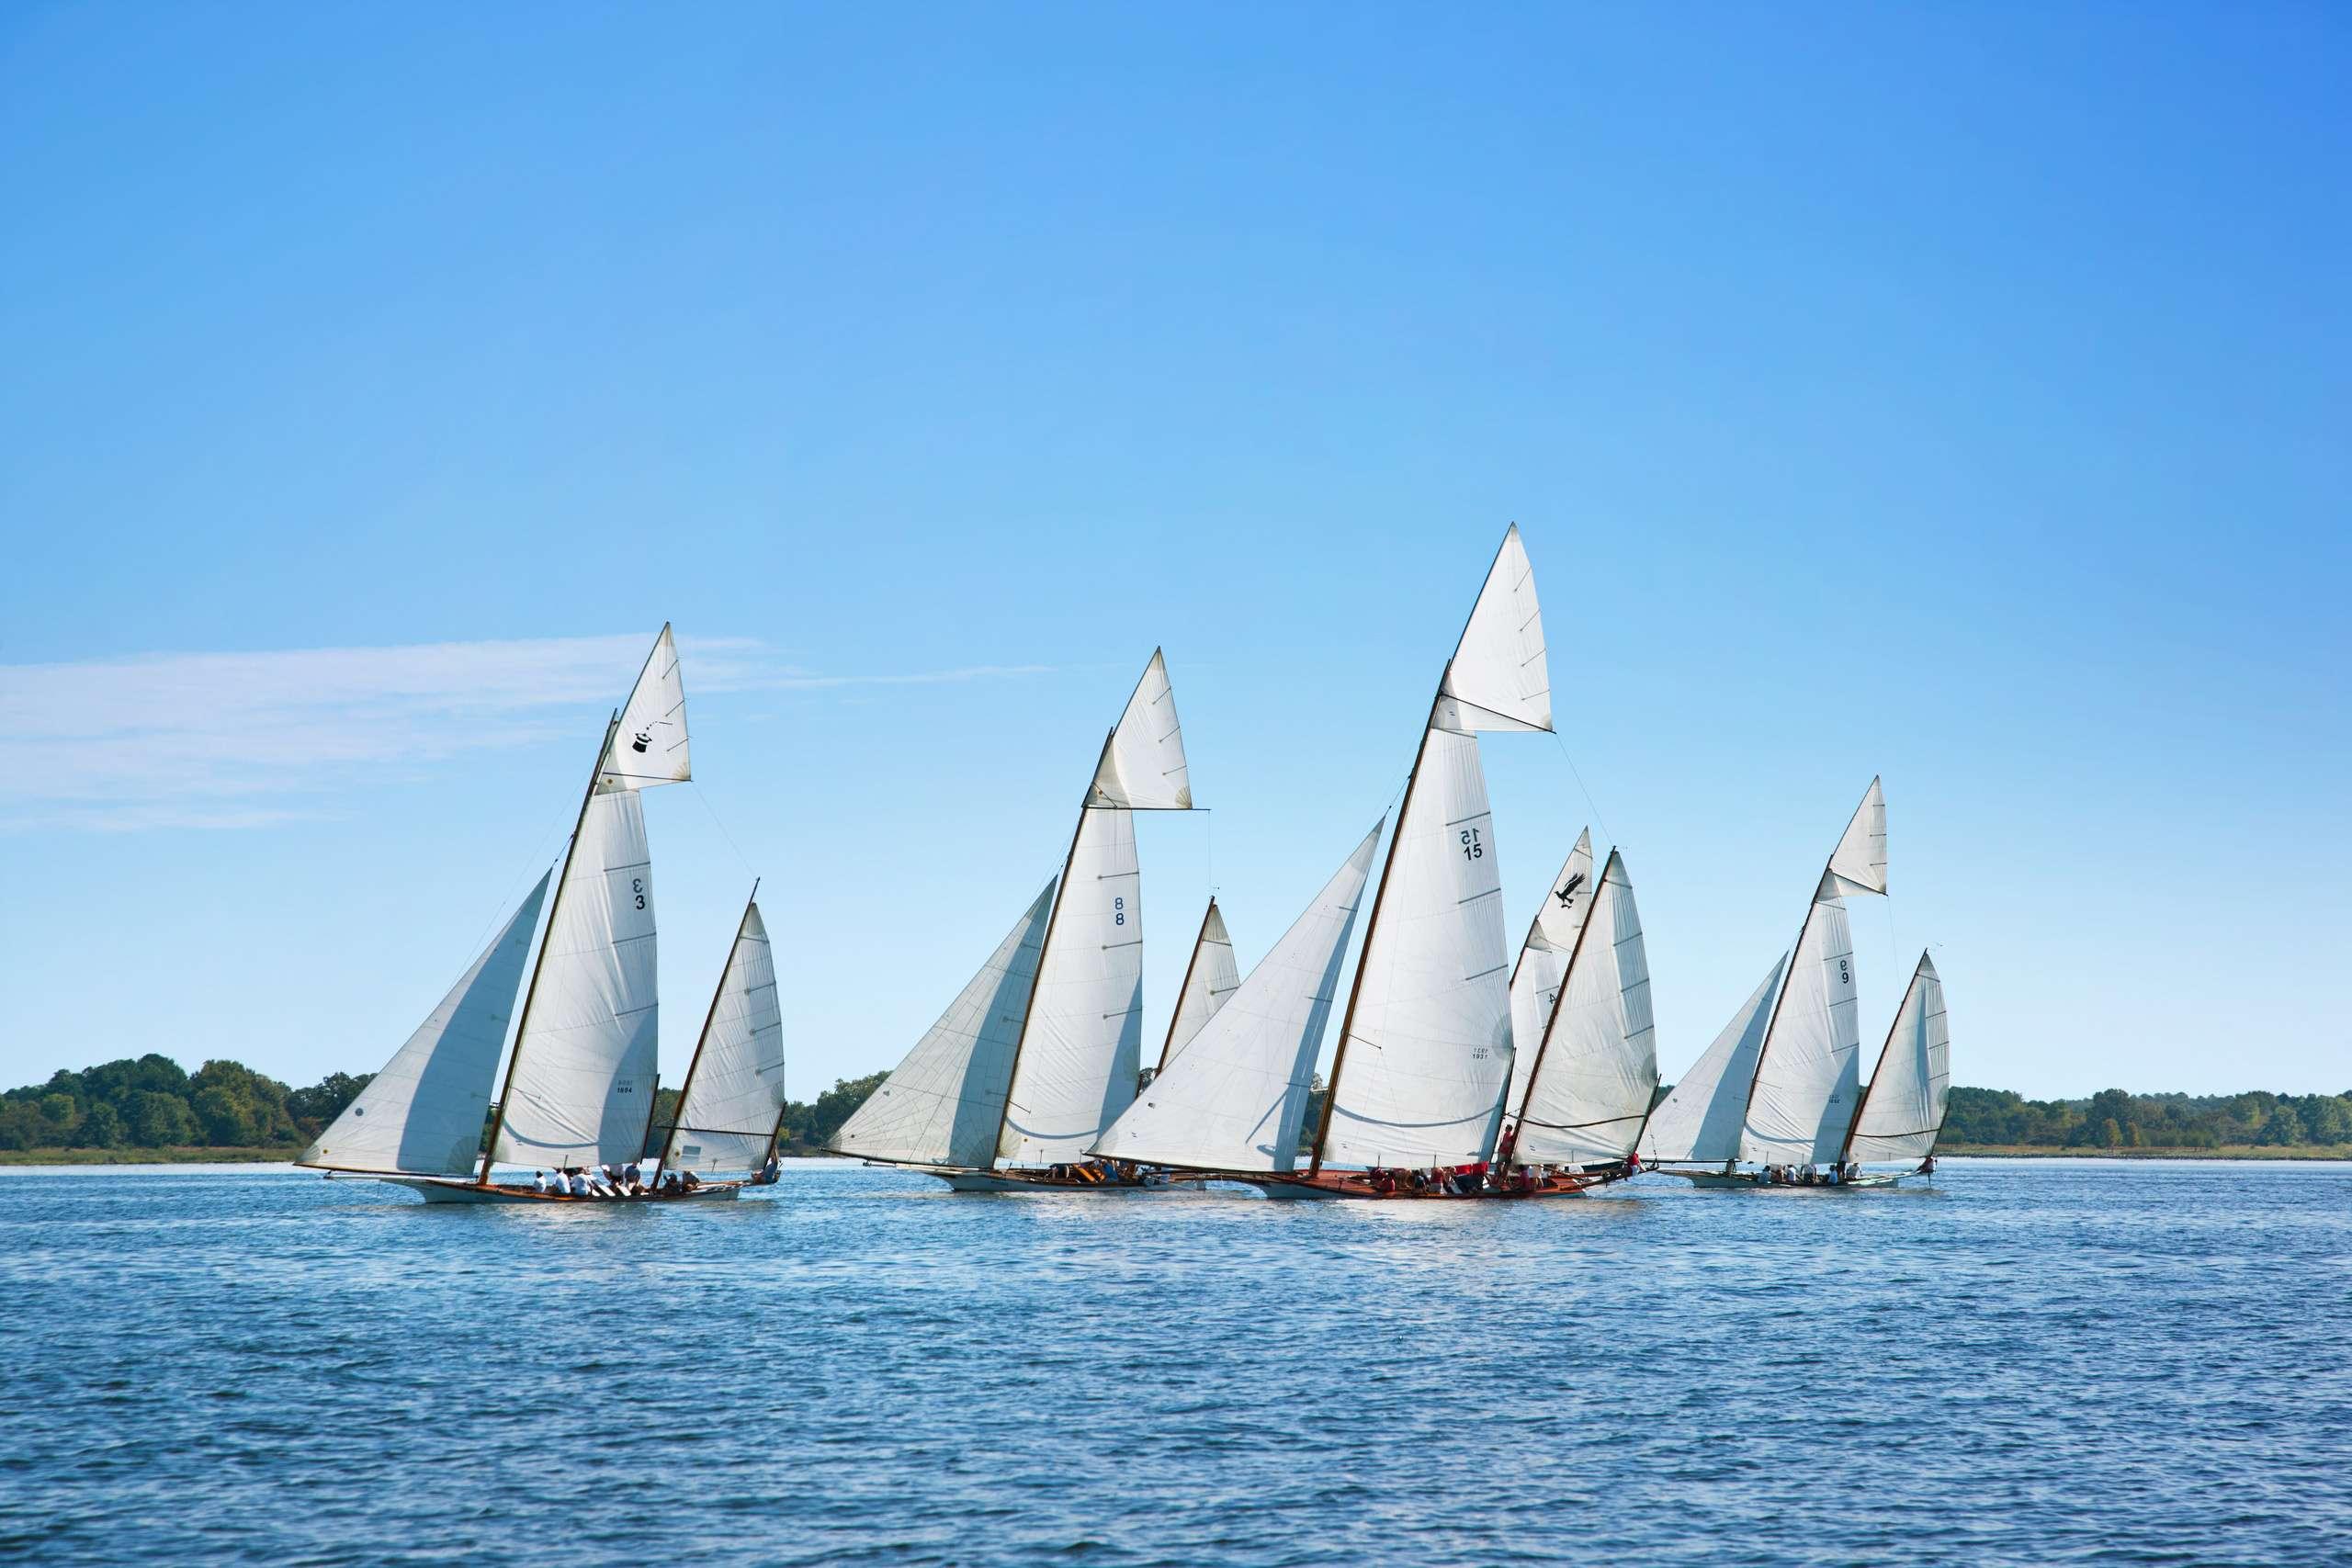 PORTFOLIO - Sailing - Log Canoes #4   PCG564